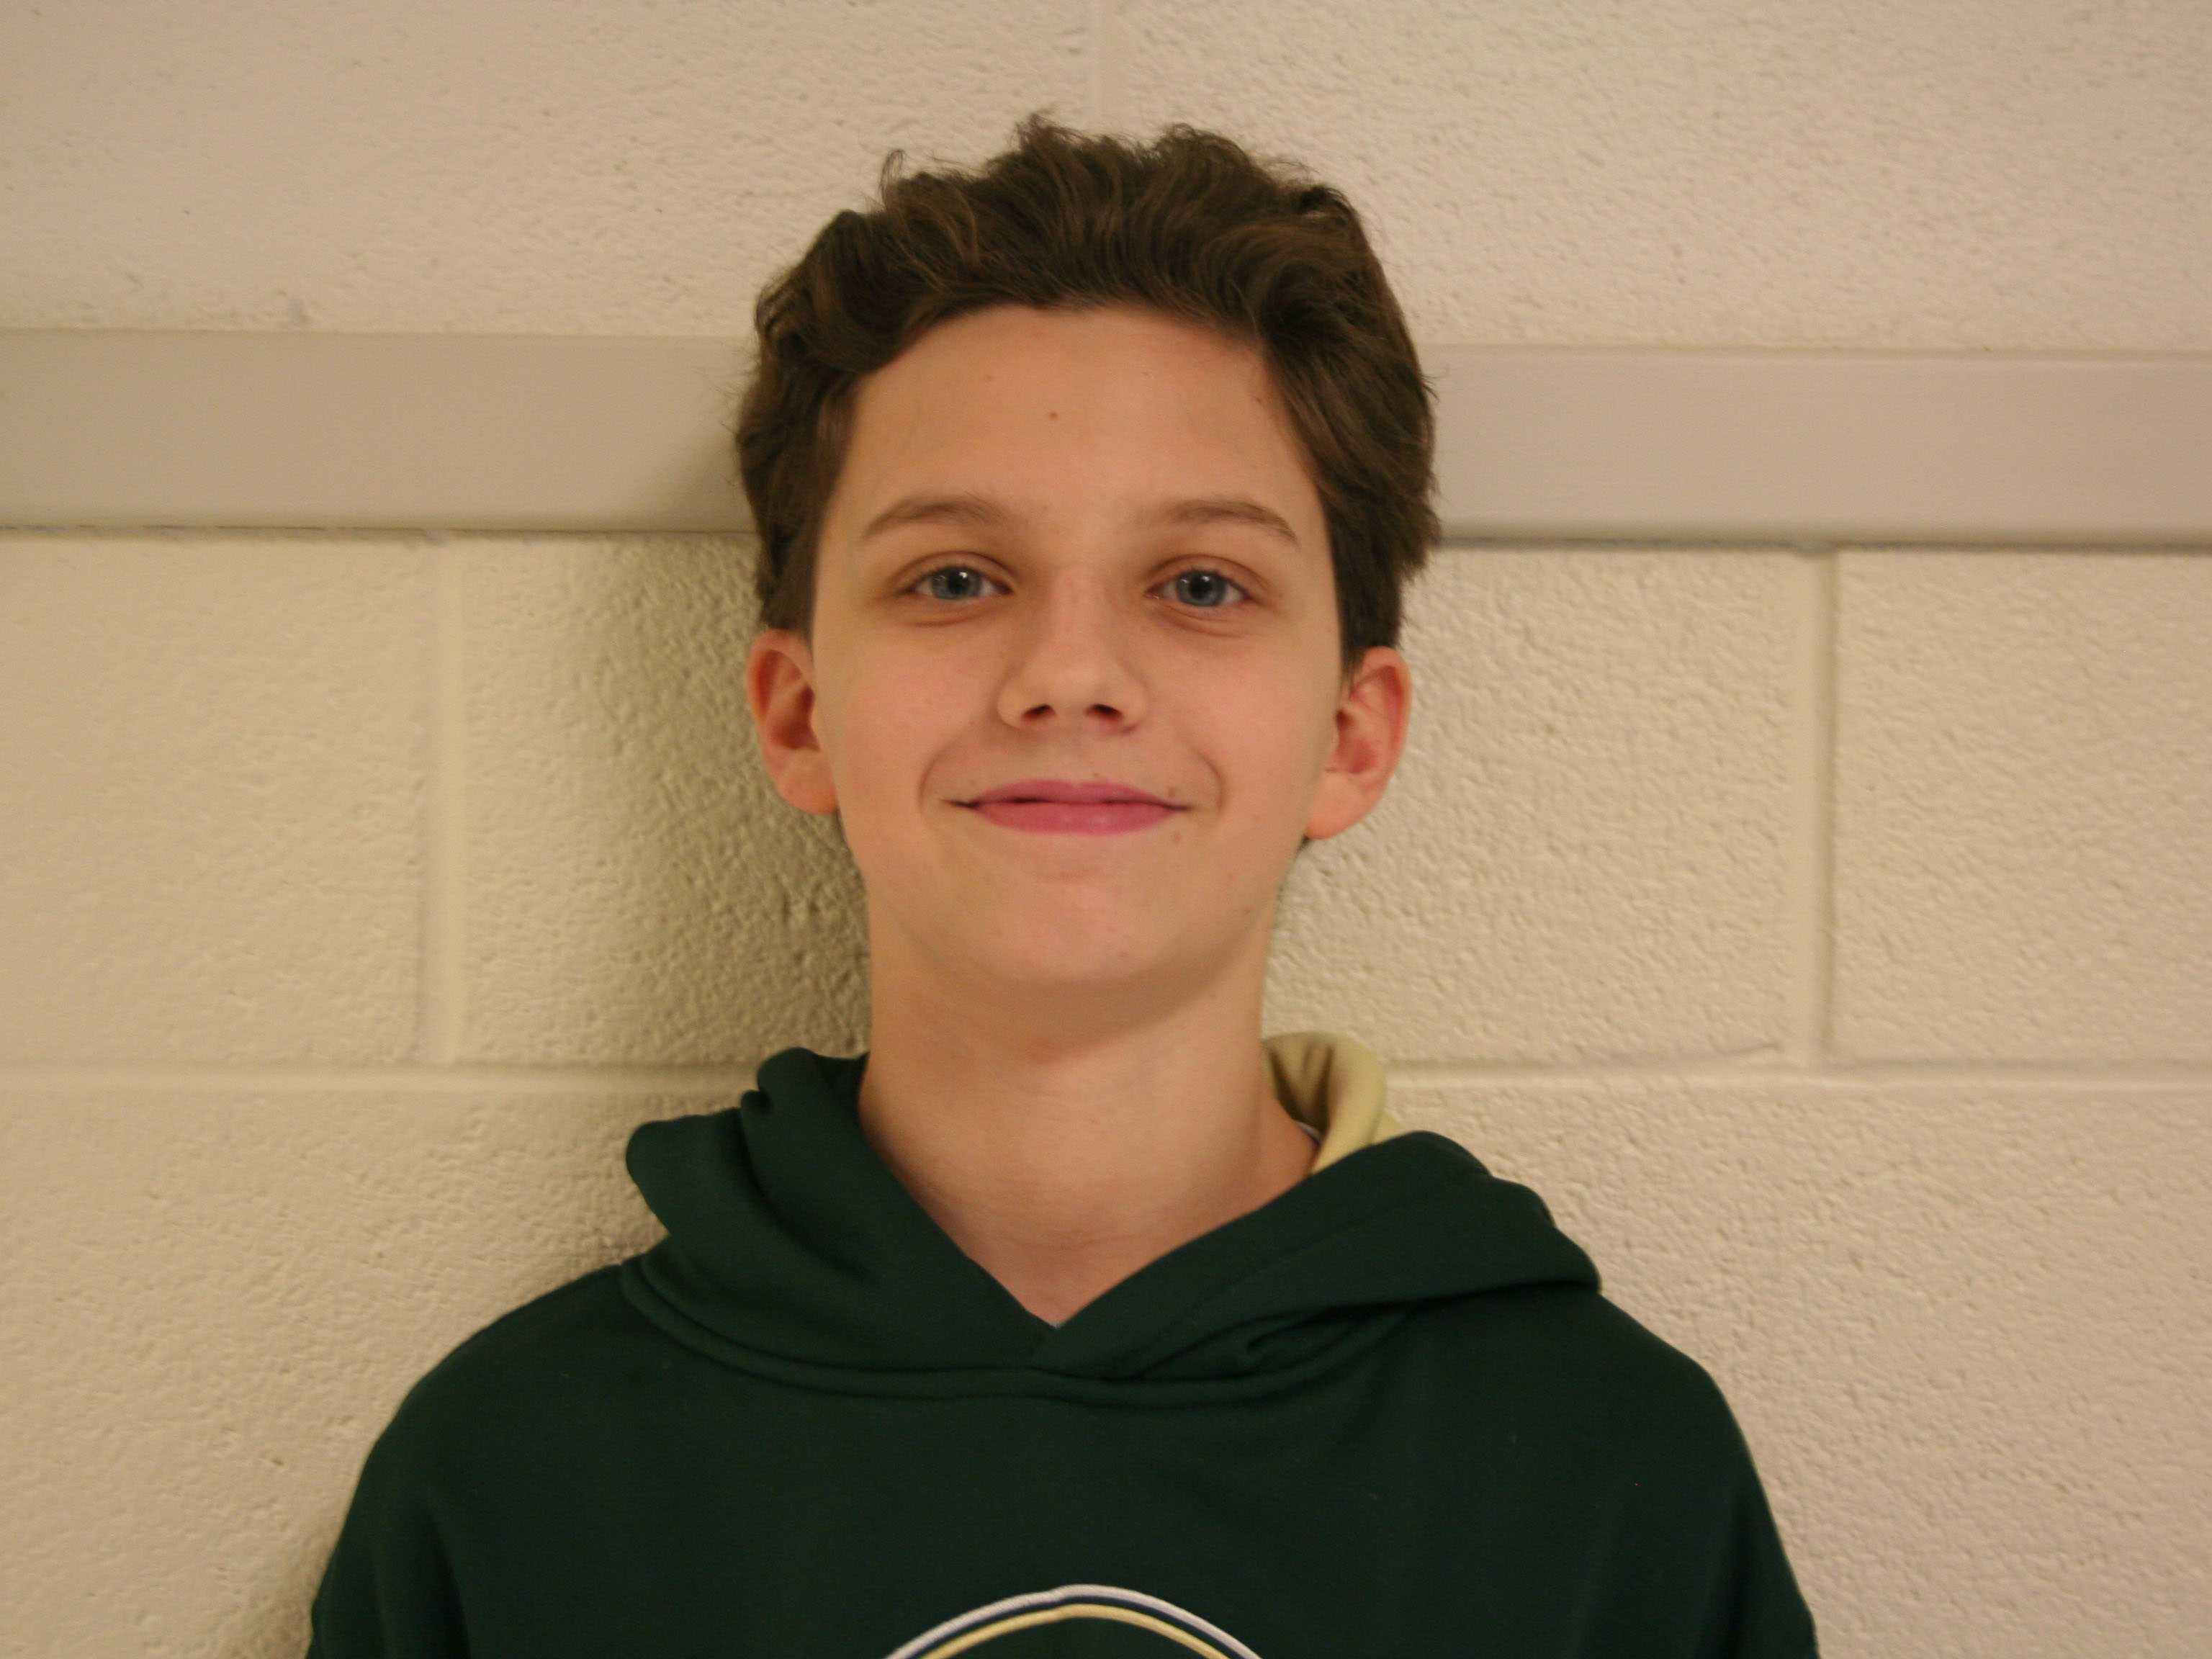 Sophomore Ian Vranek posses for picture